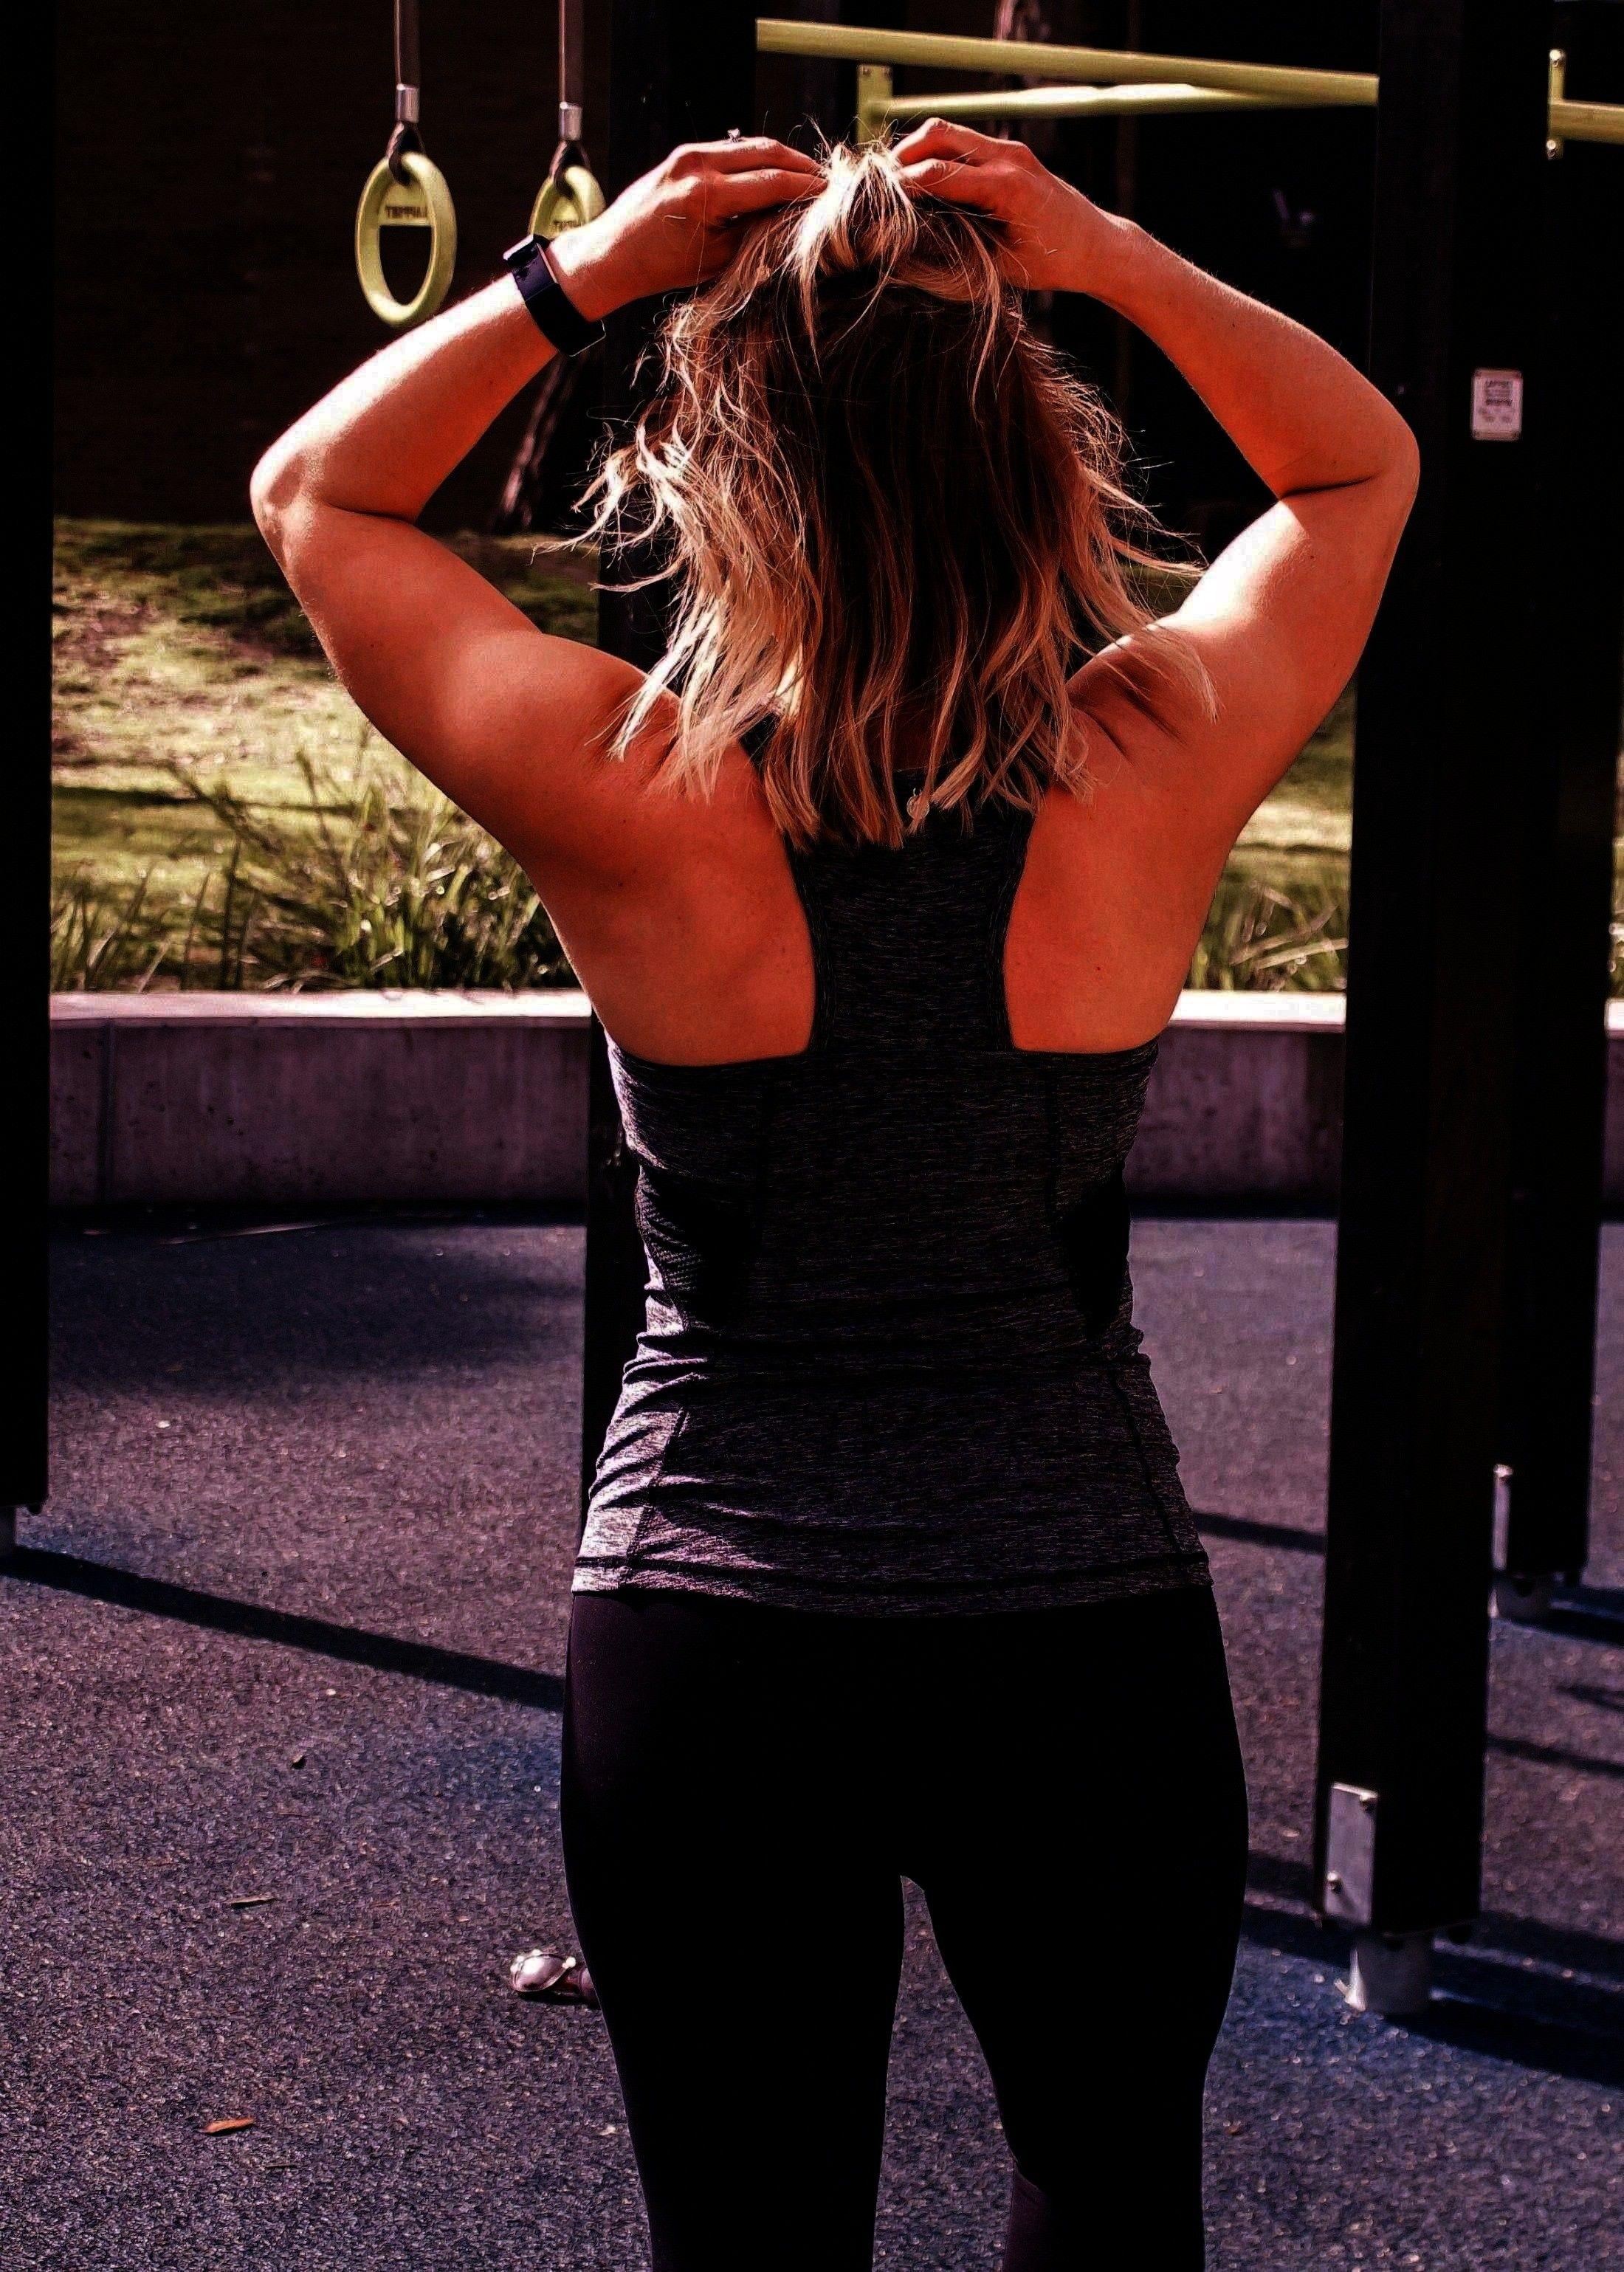 #activewearinspiration #activeempower #athleticwear #fittedactive #tonesmband #collection #activewea...